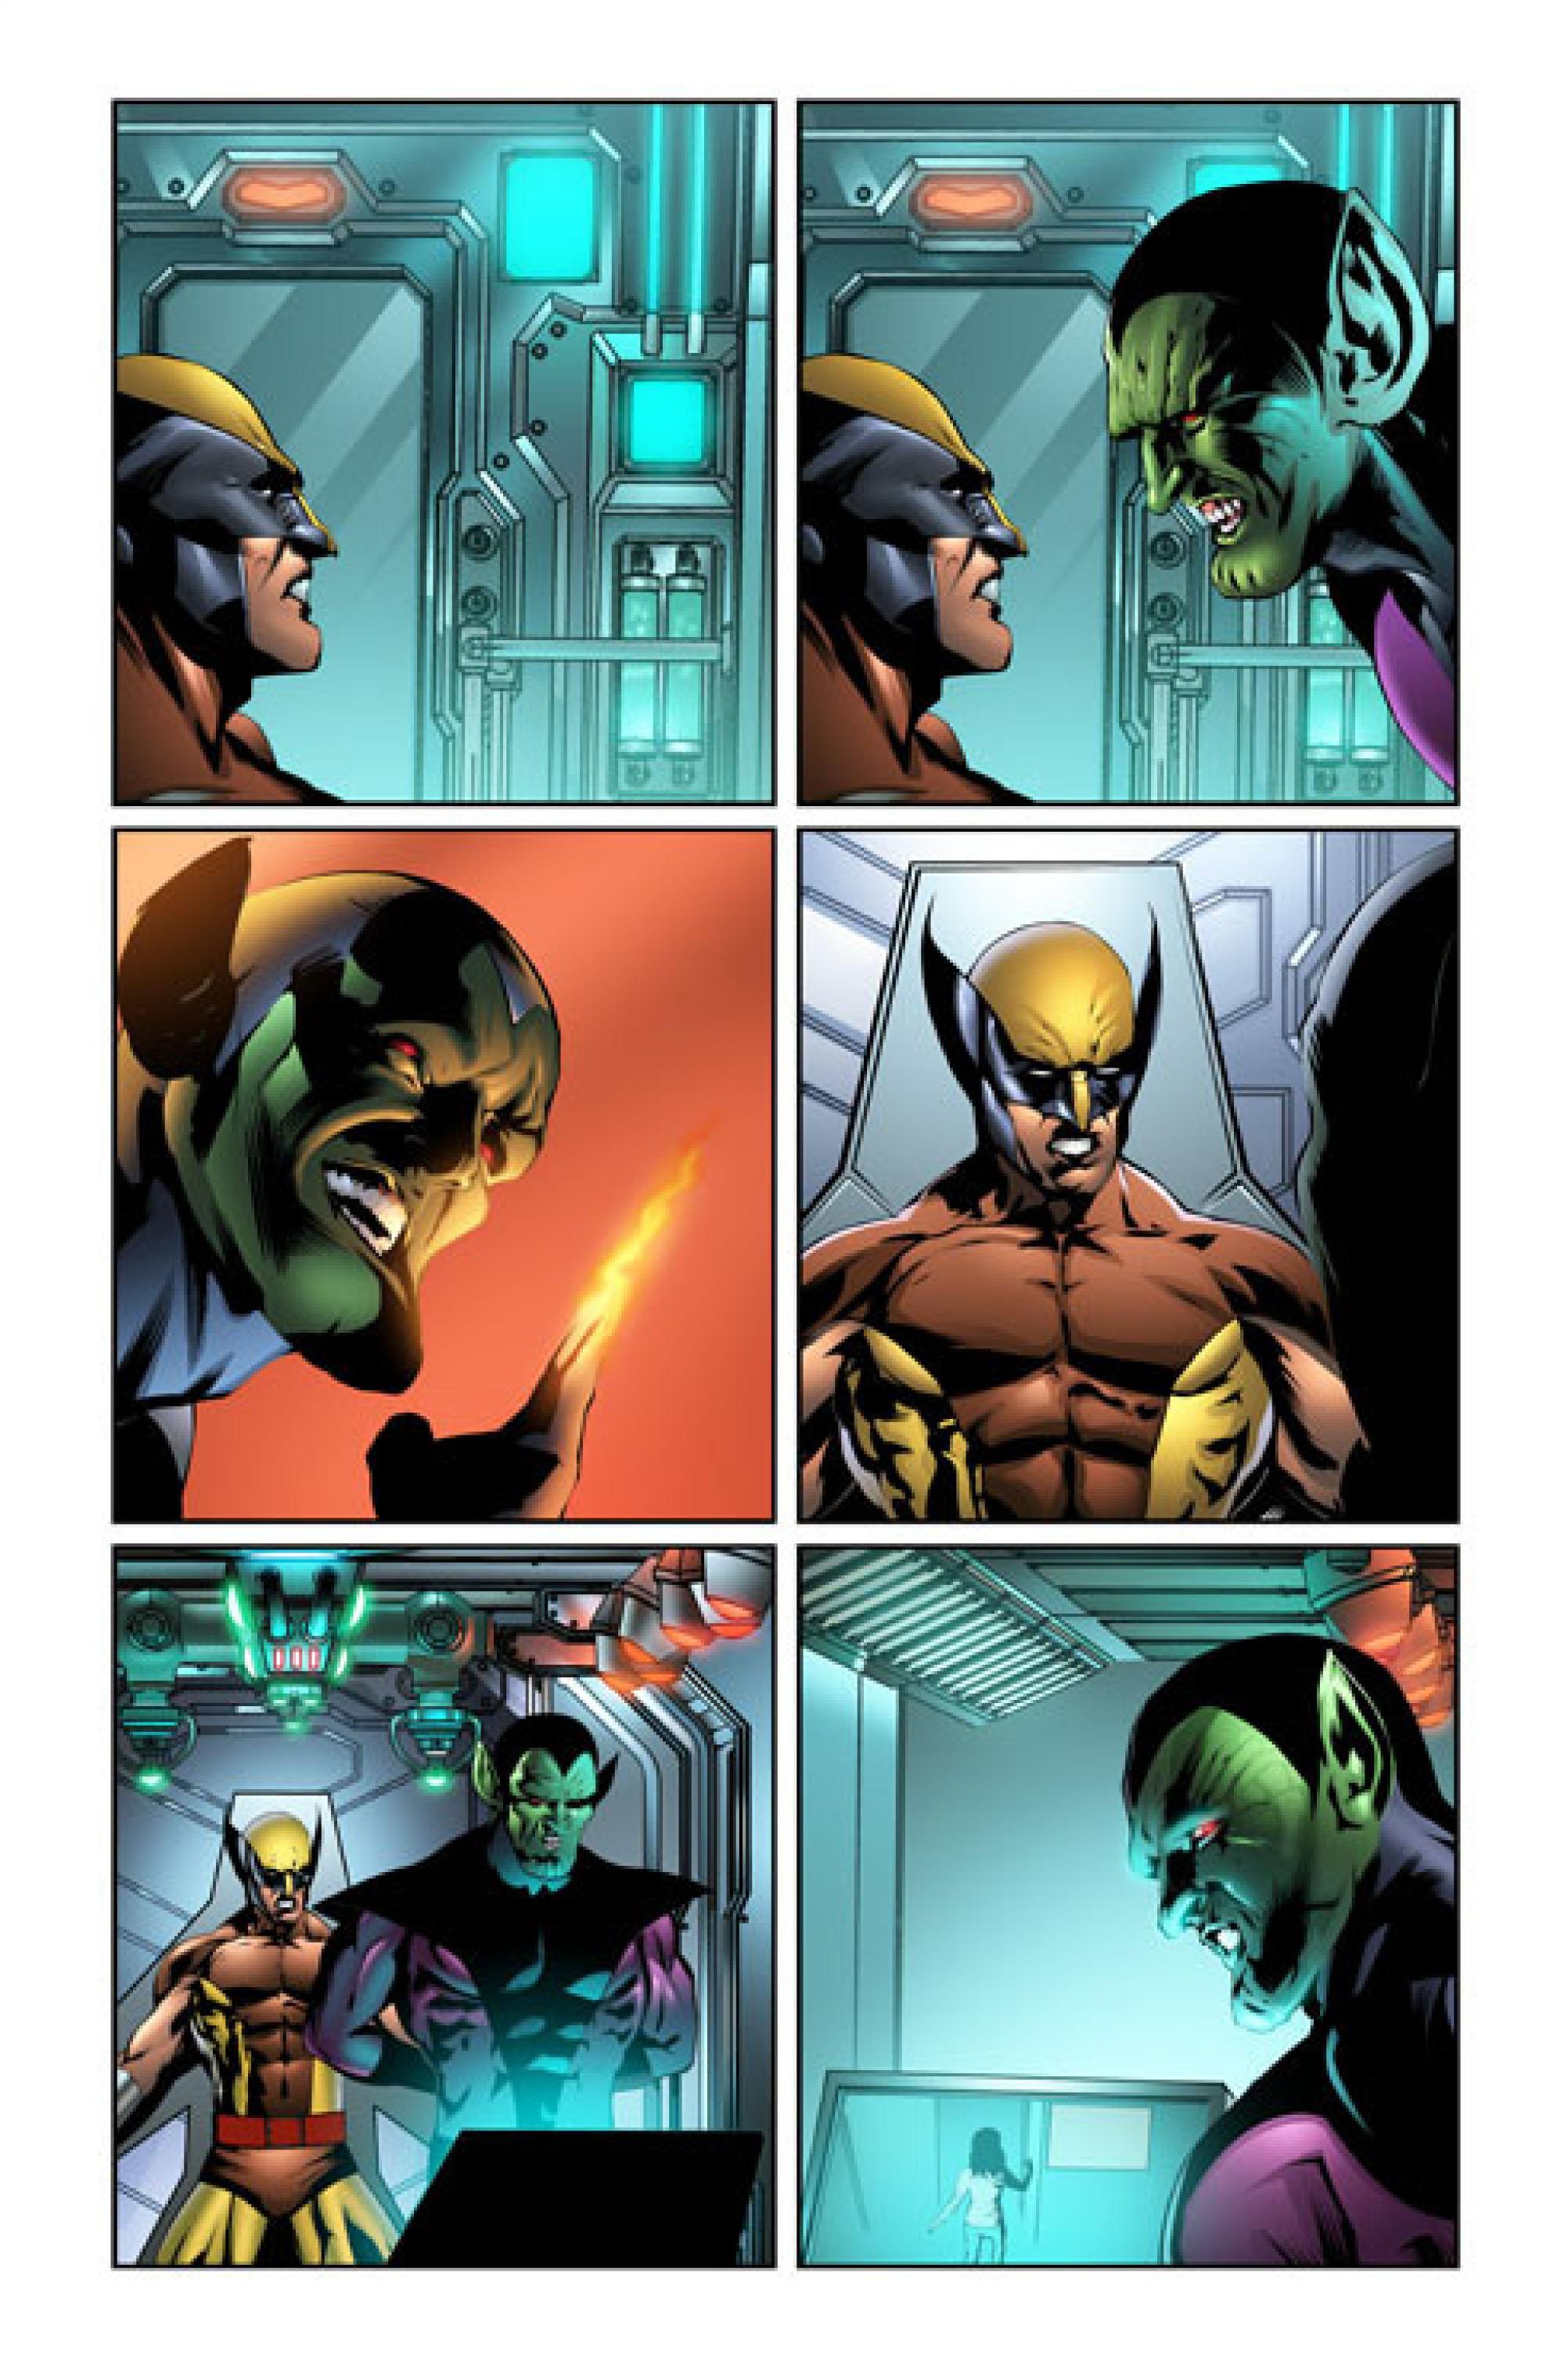 Calero_Wolverine-12.jpg